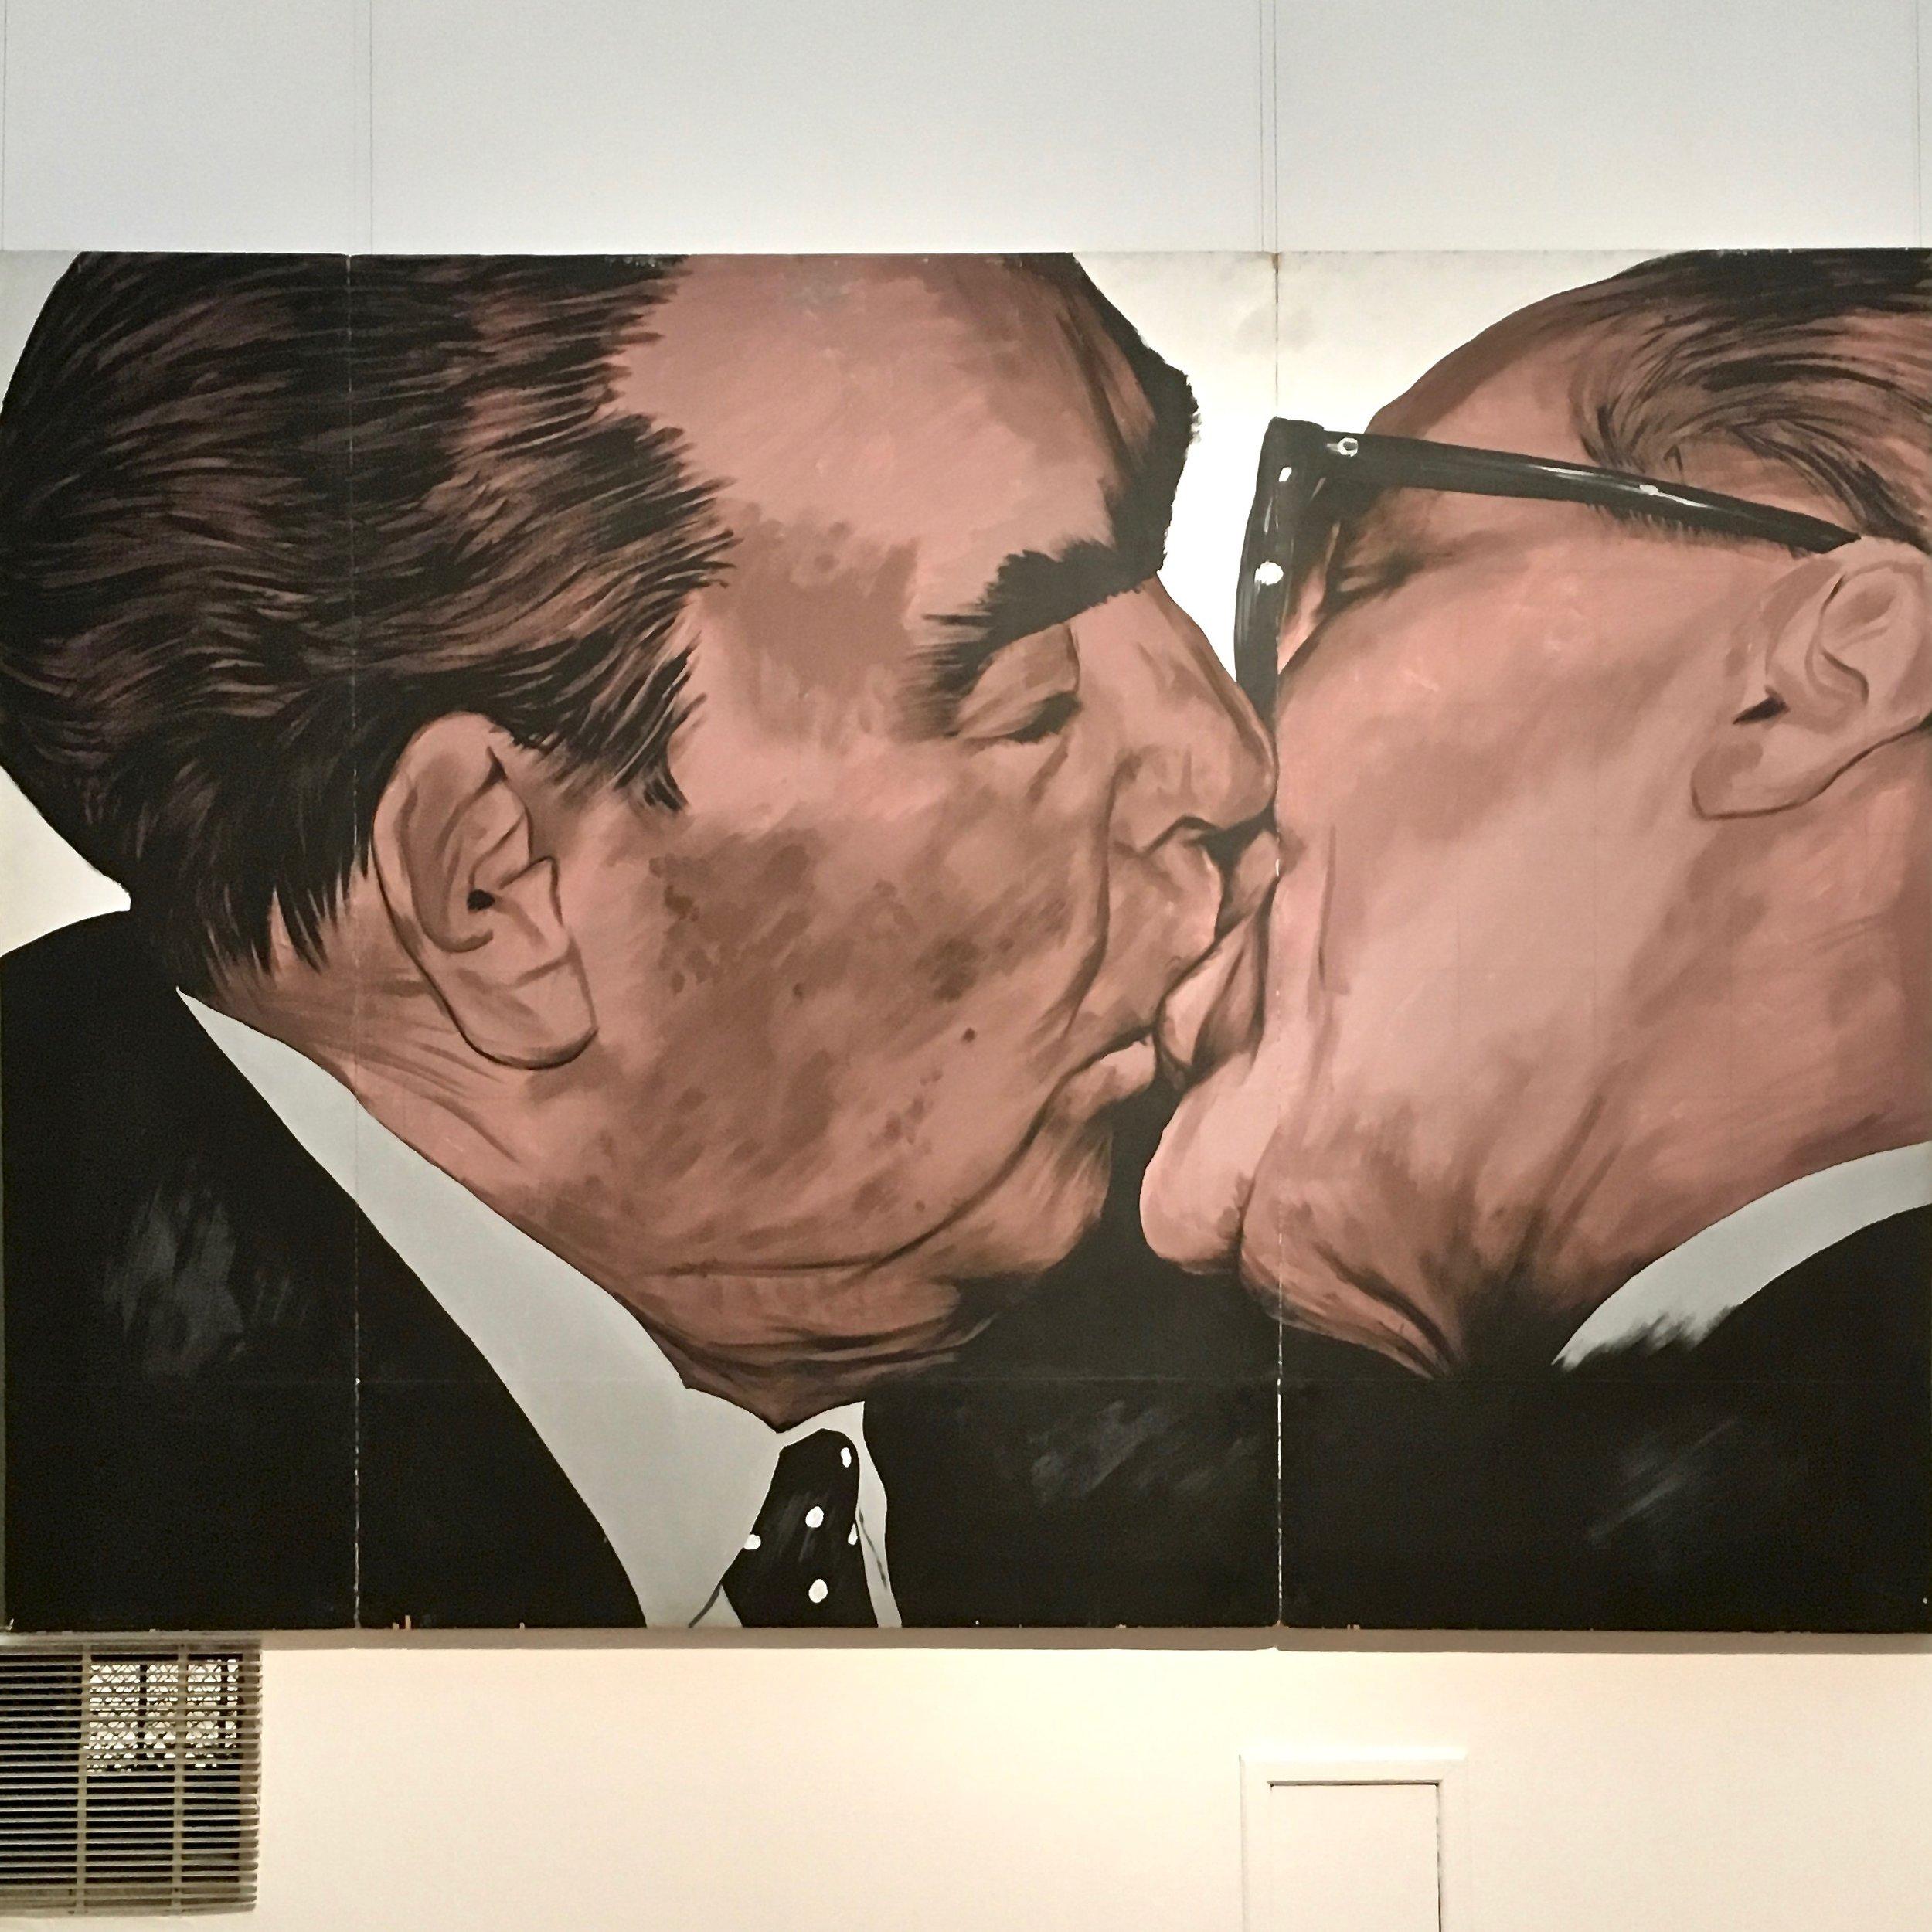 Dmitry Vrubel - Testvéri csók, 1990